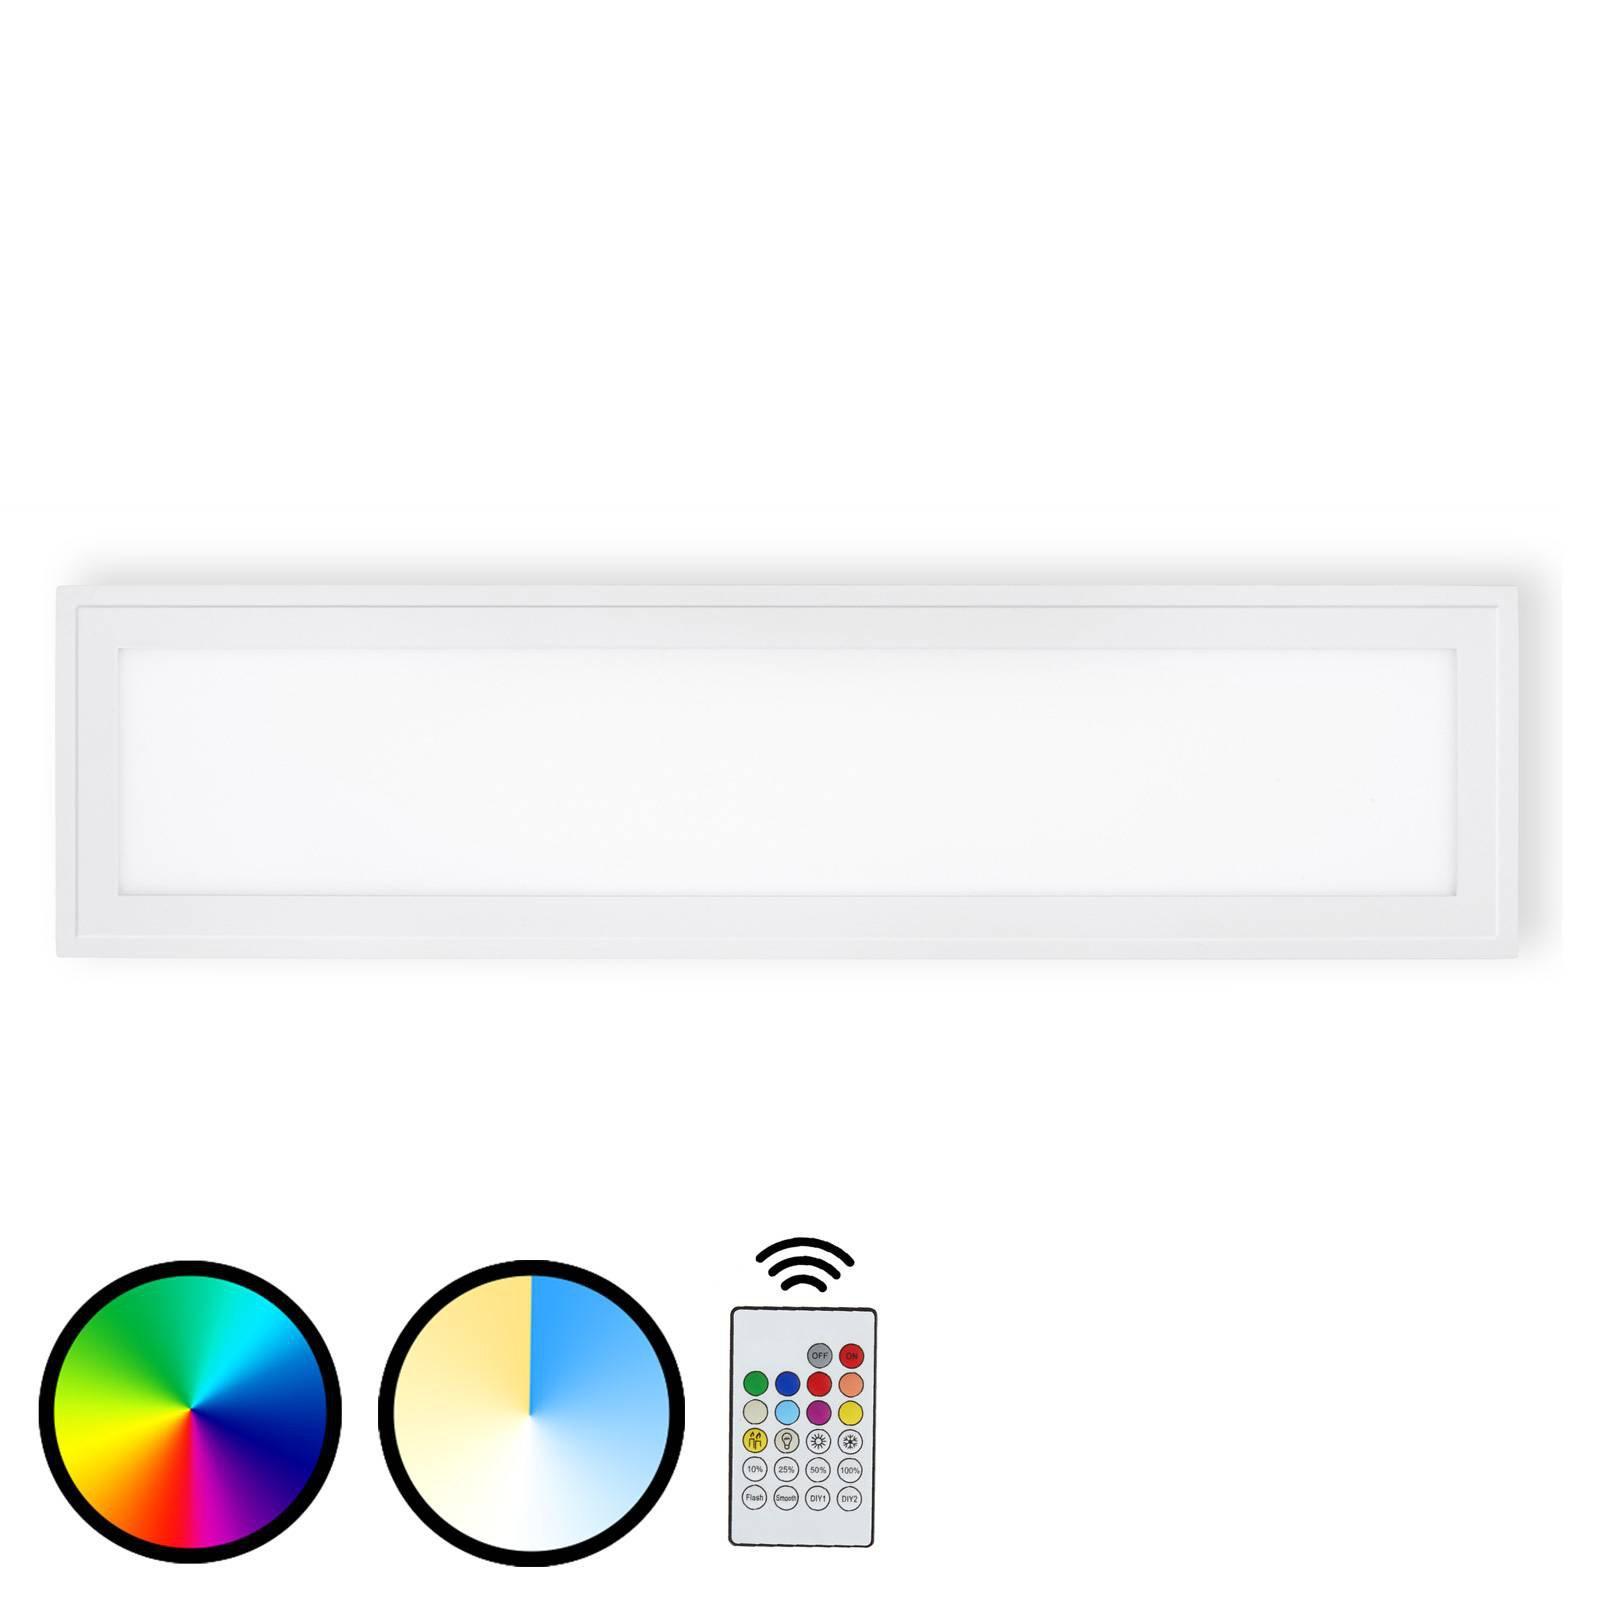 LED-taklampe 3033-016 Piatto med fjernkontroll